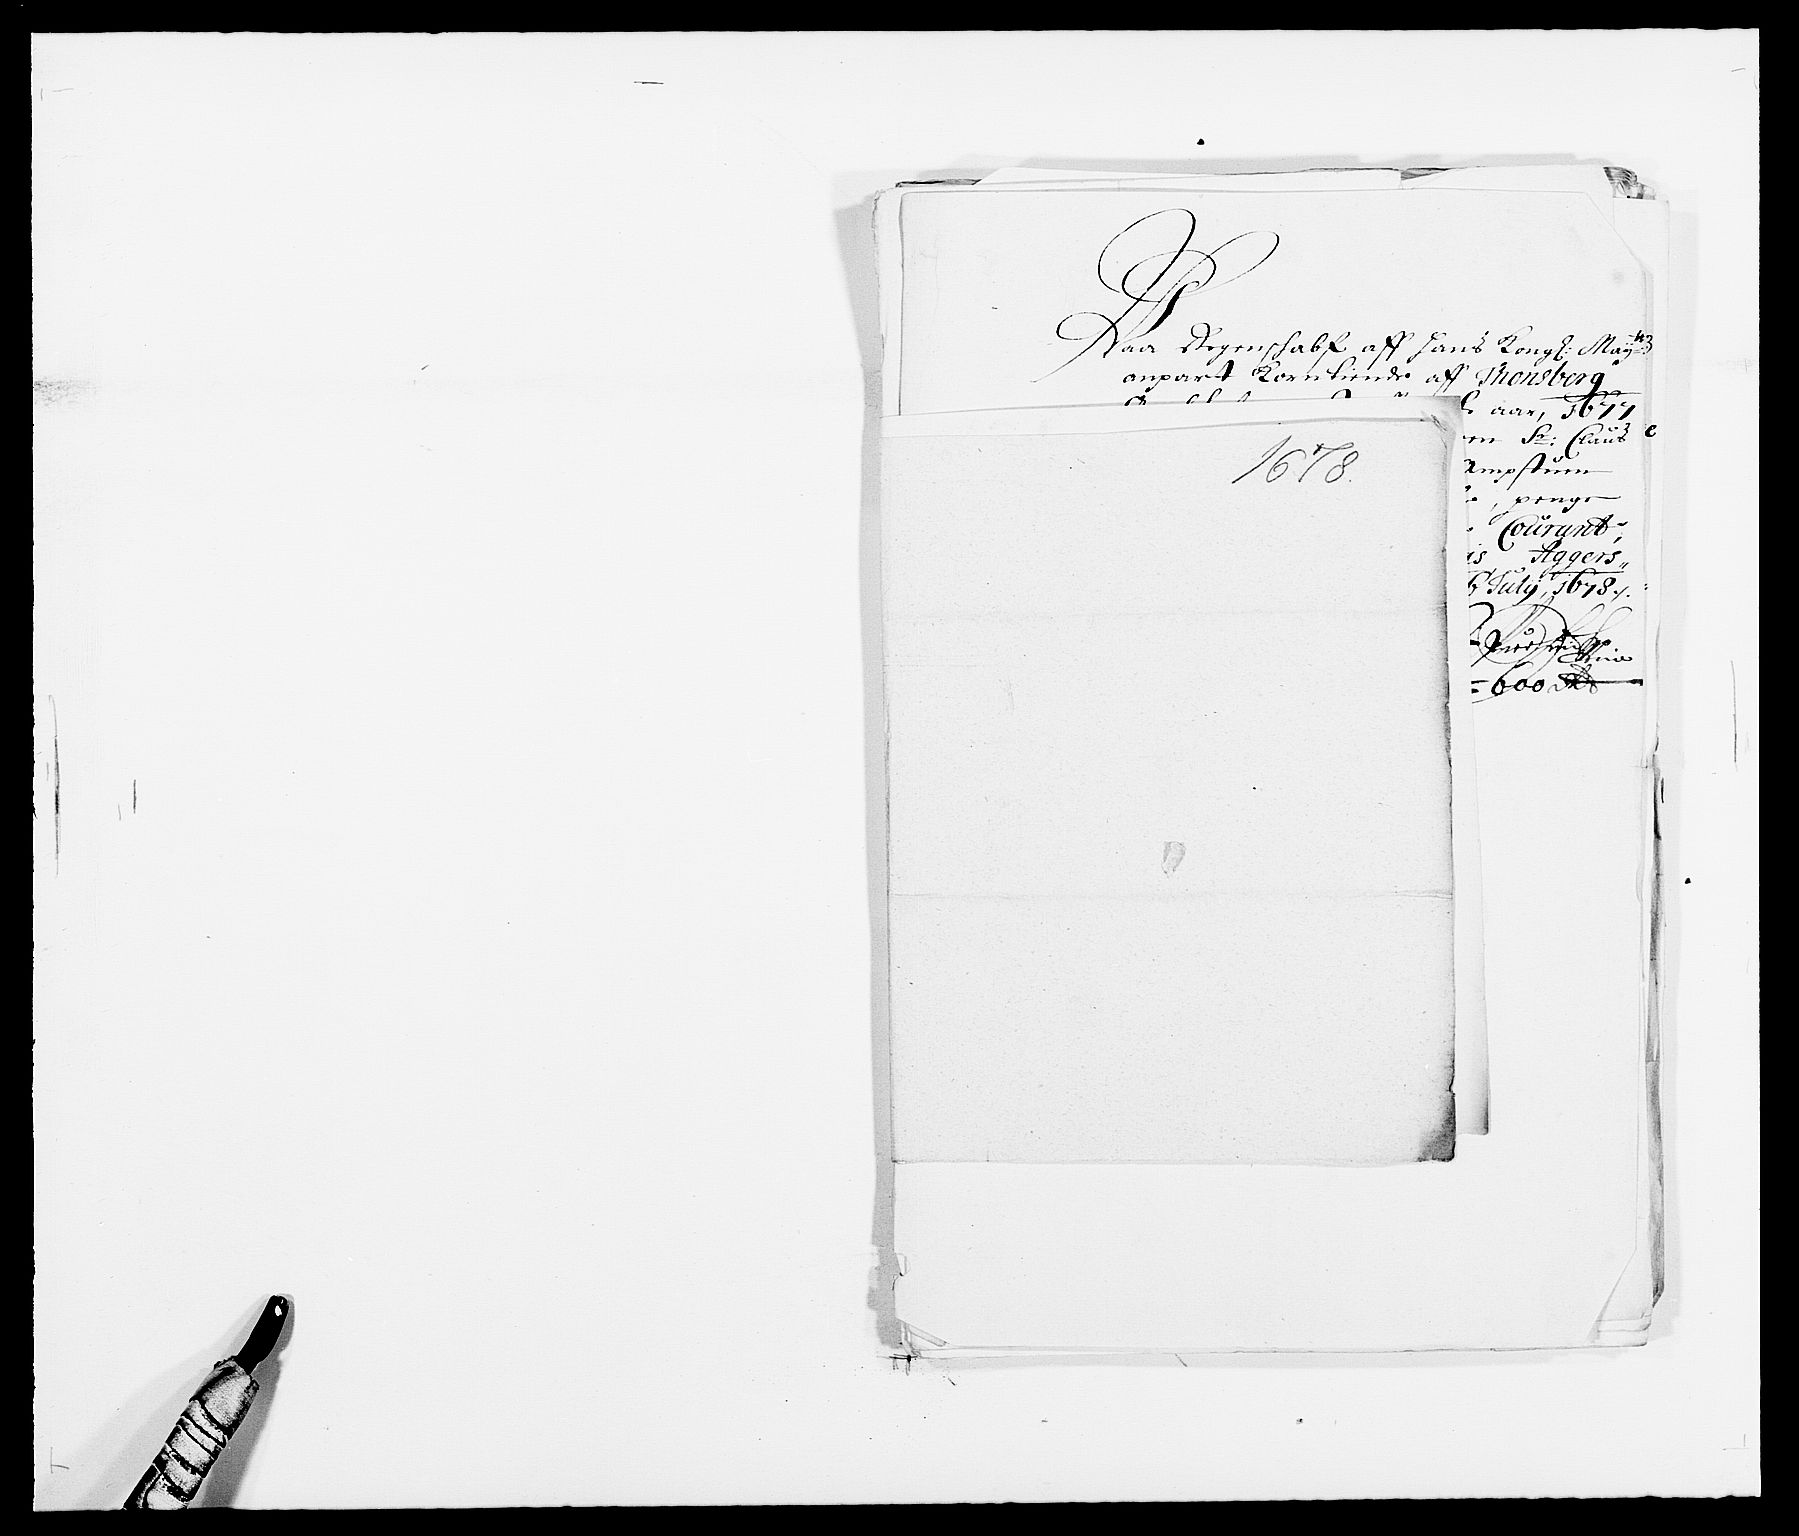 RA, Rentekammeret inntil 1814, Reviderte regnskaper, Fogderegnskap, R32/L1845: Fogderegnskap Jarlsberg grevskap, 1676-1678, s. 456